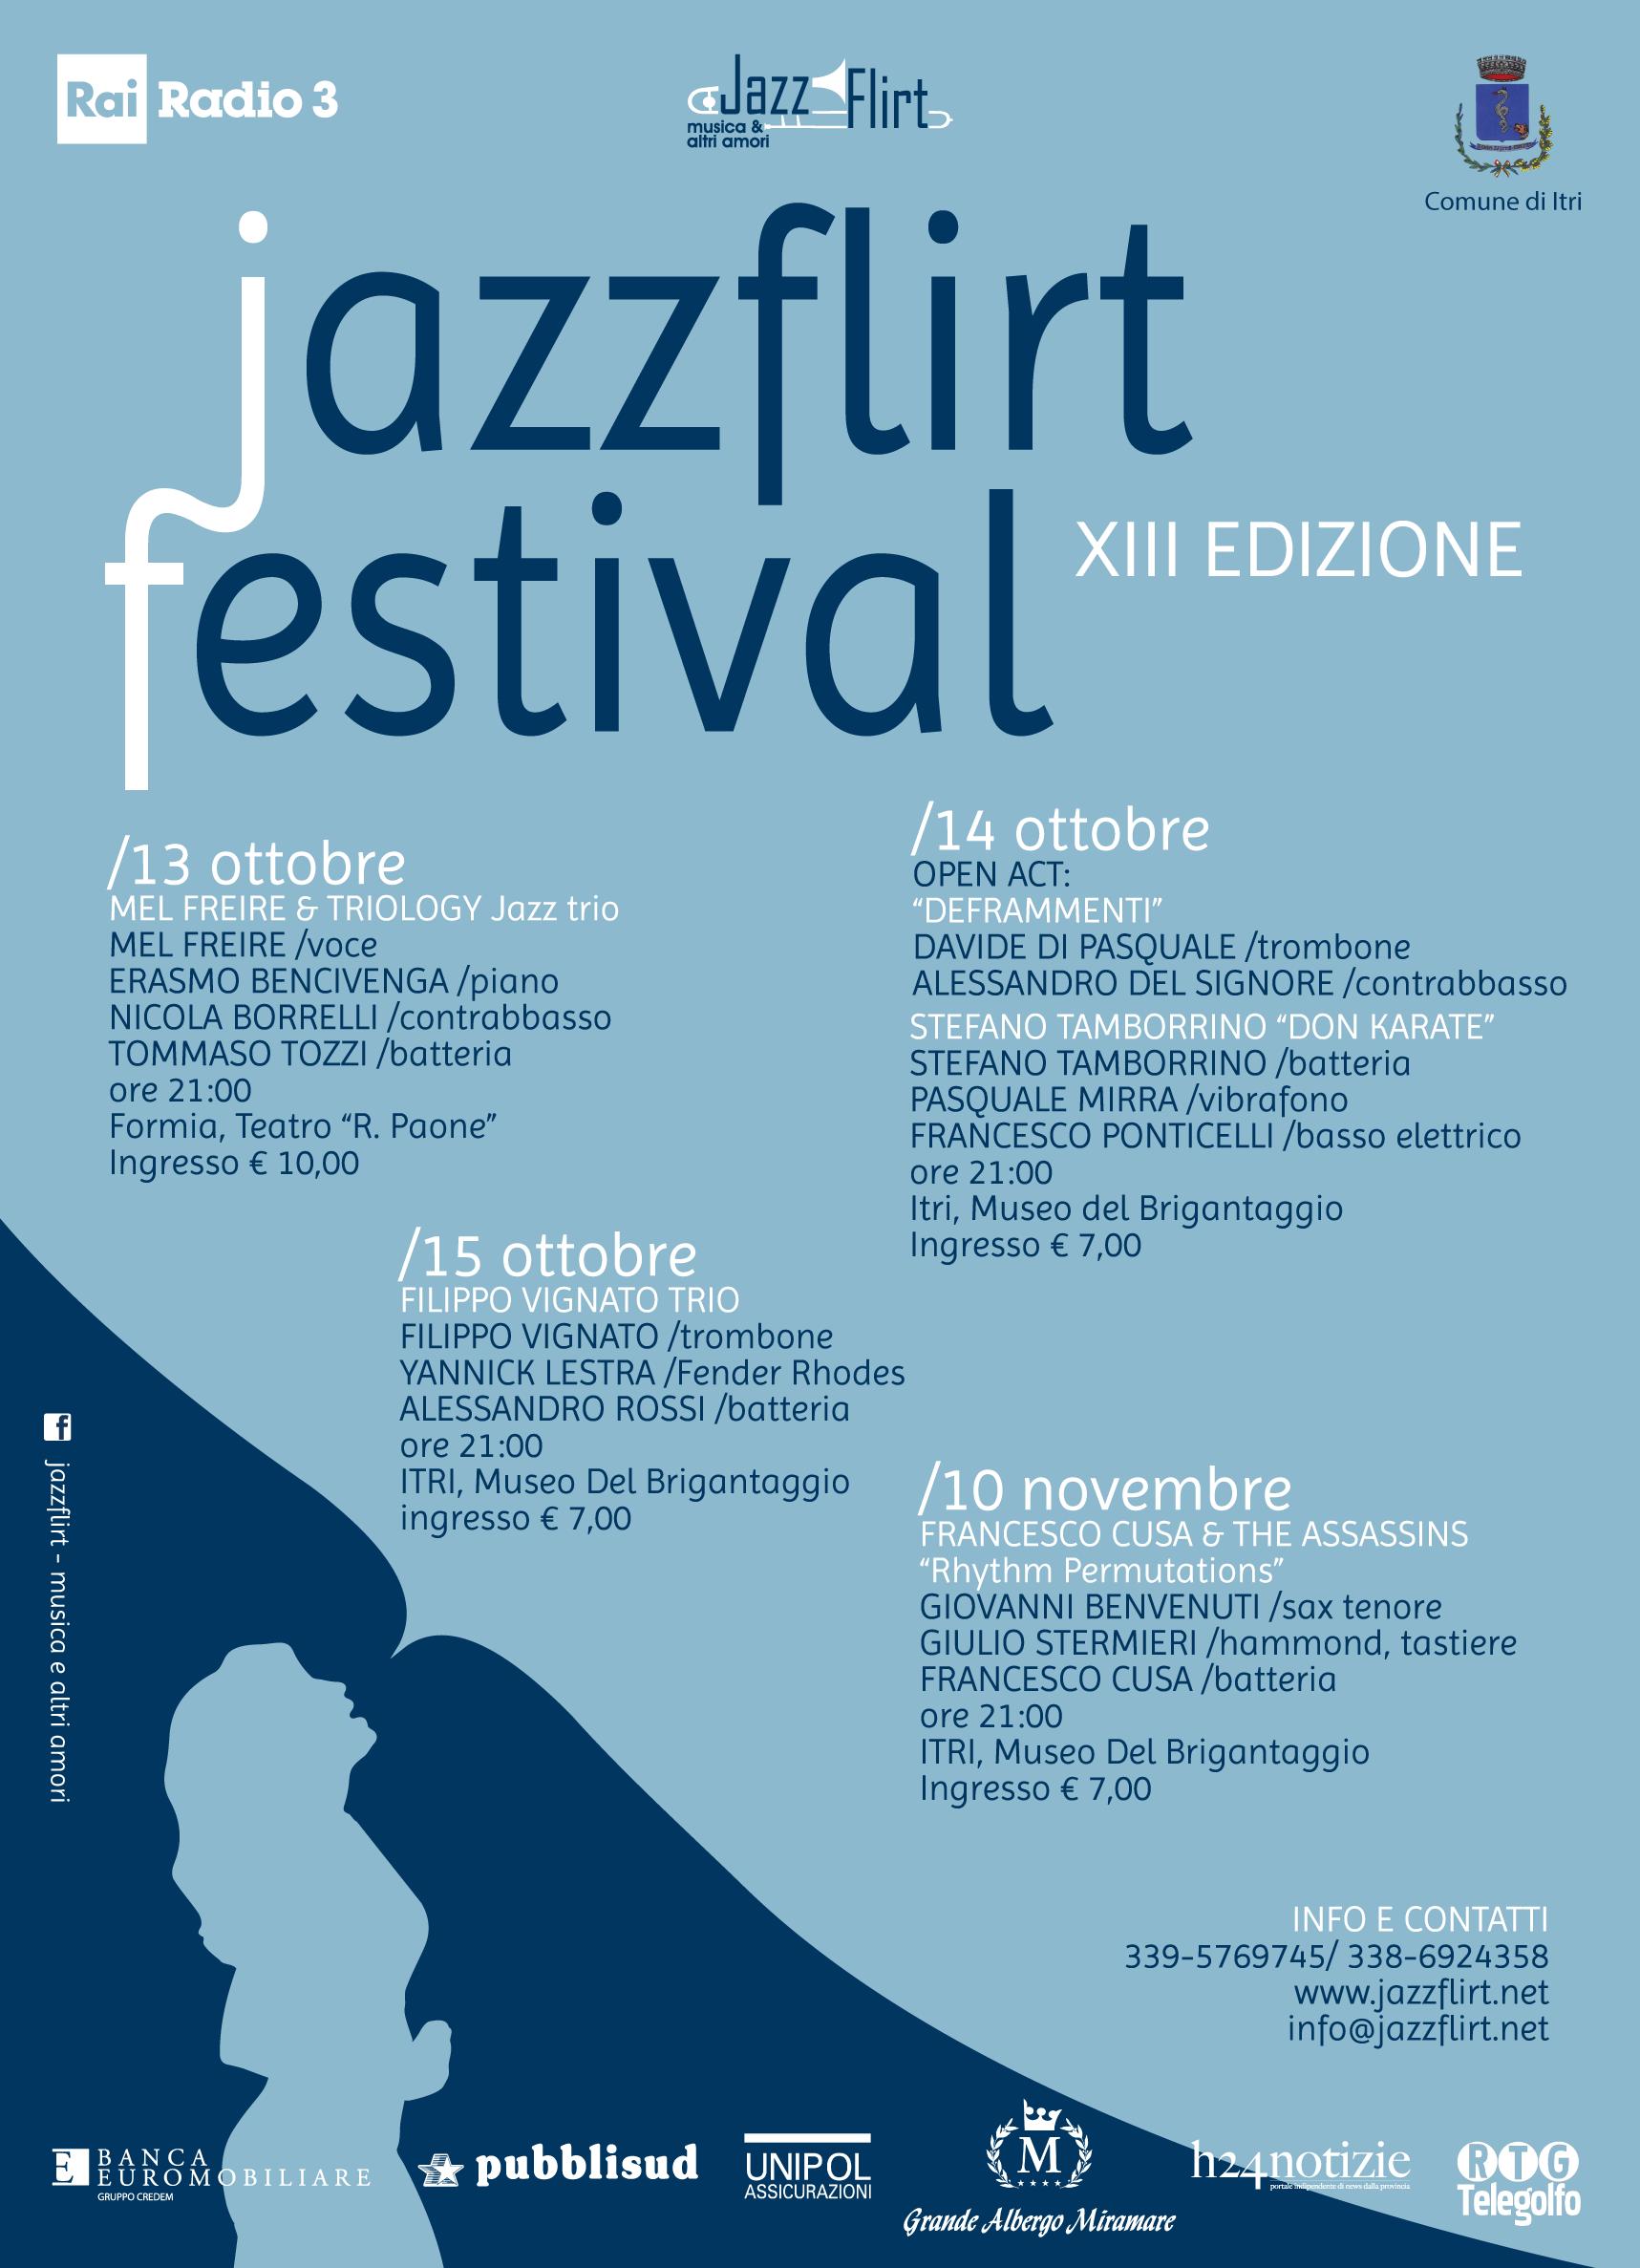 Jazz Flirt Festival 2017